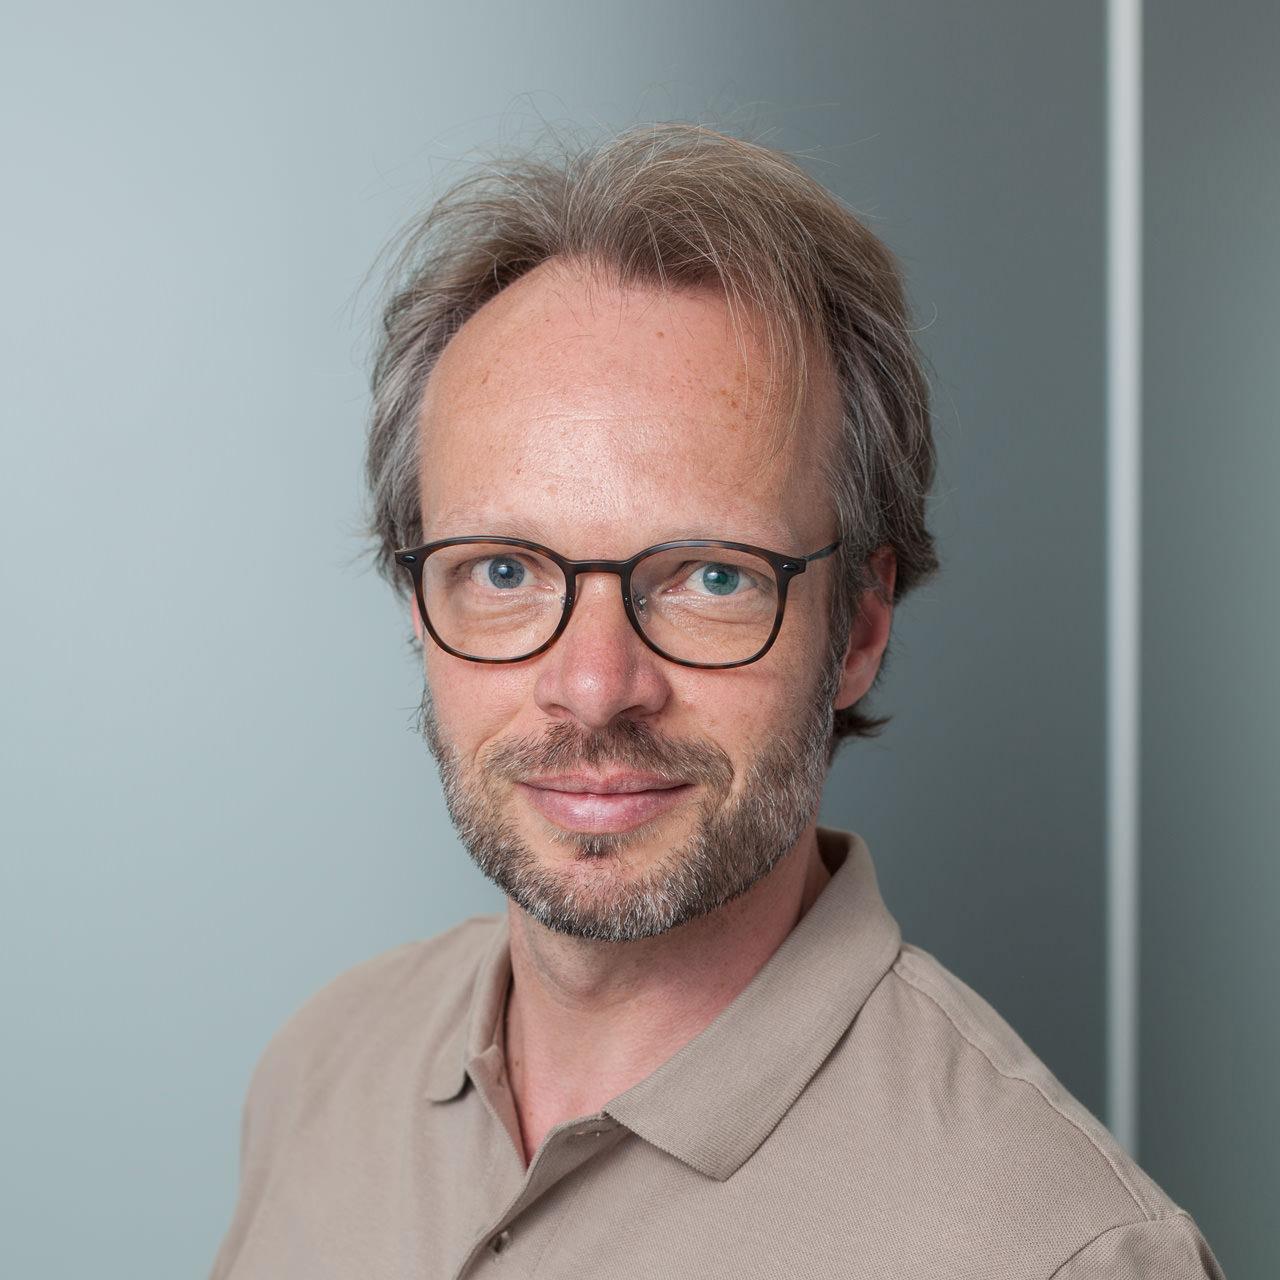 Sportmediziner Dr. Rühl in Bensberg